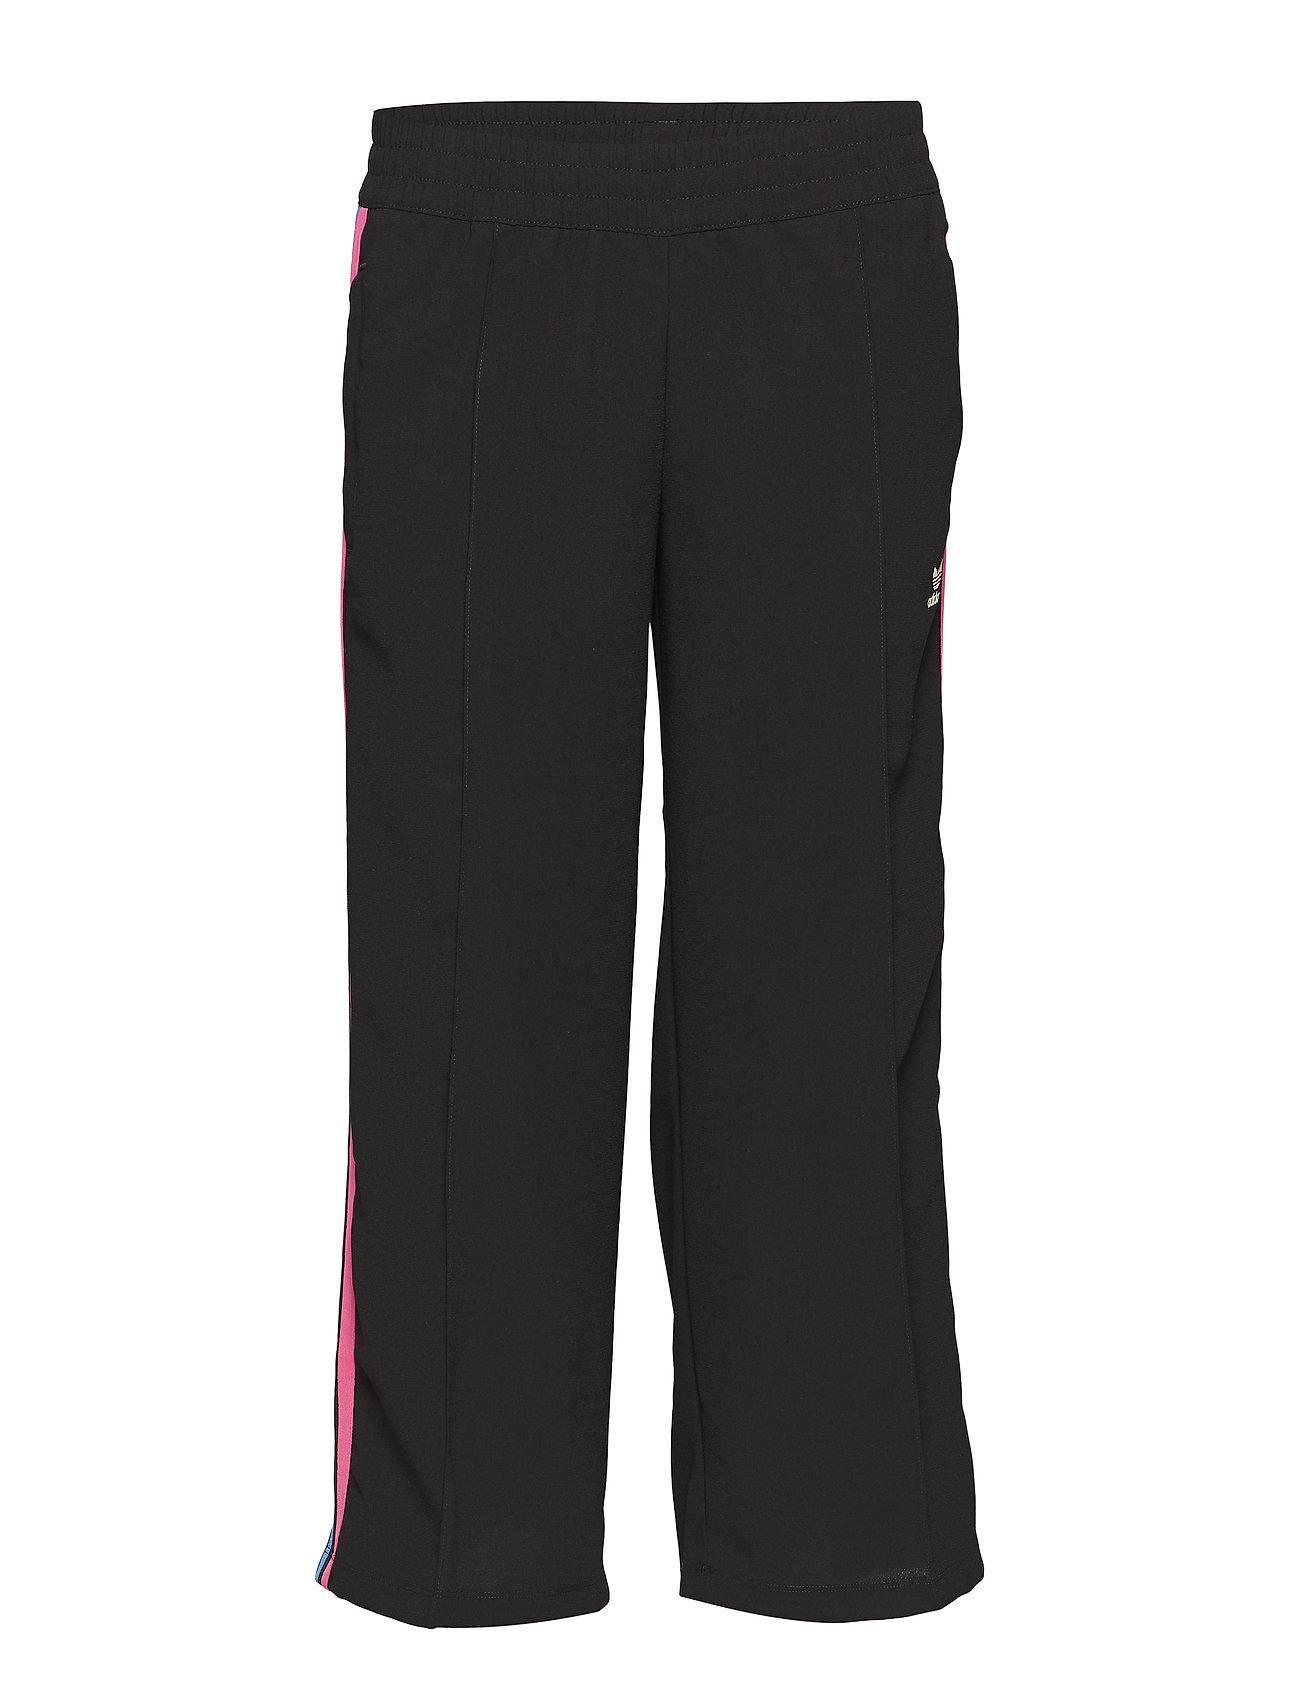 adidas Originals 7/8 TRACK PANT - BLACK